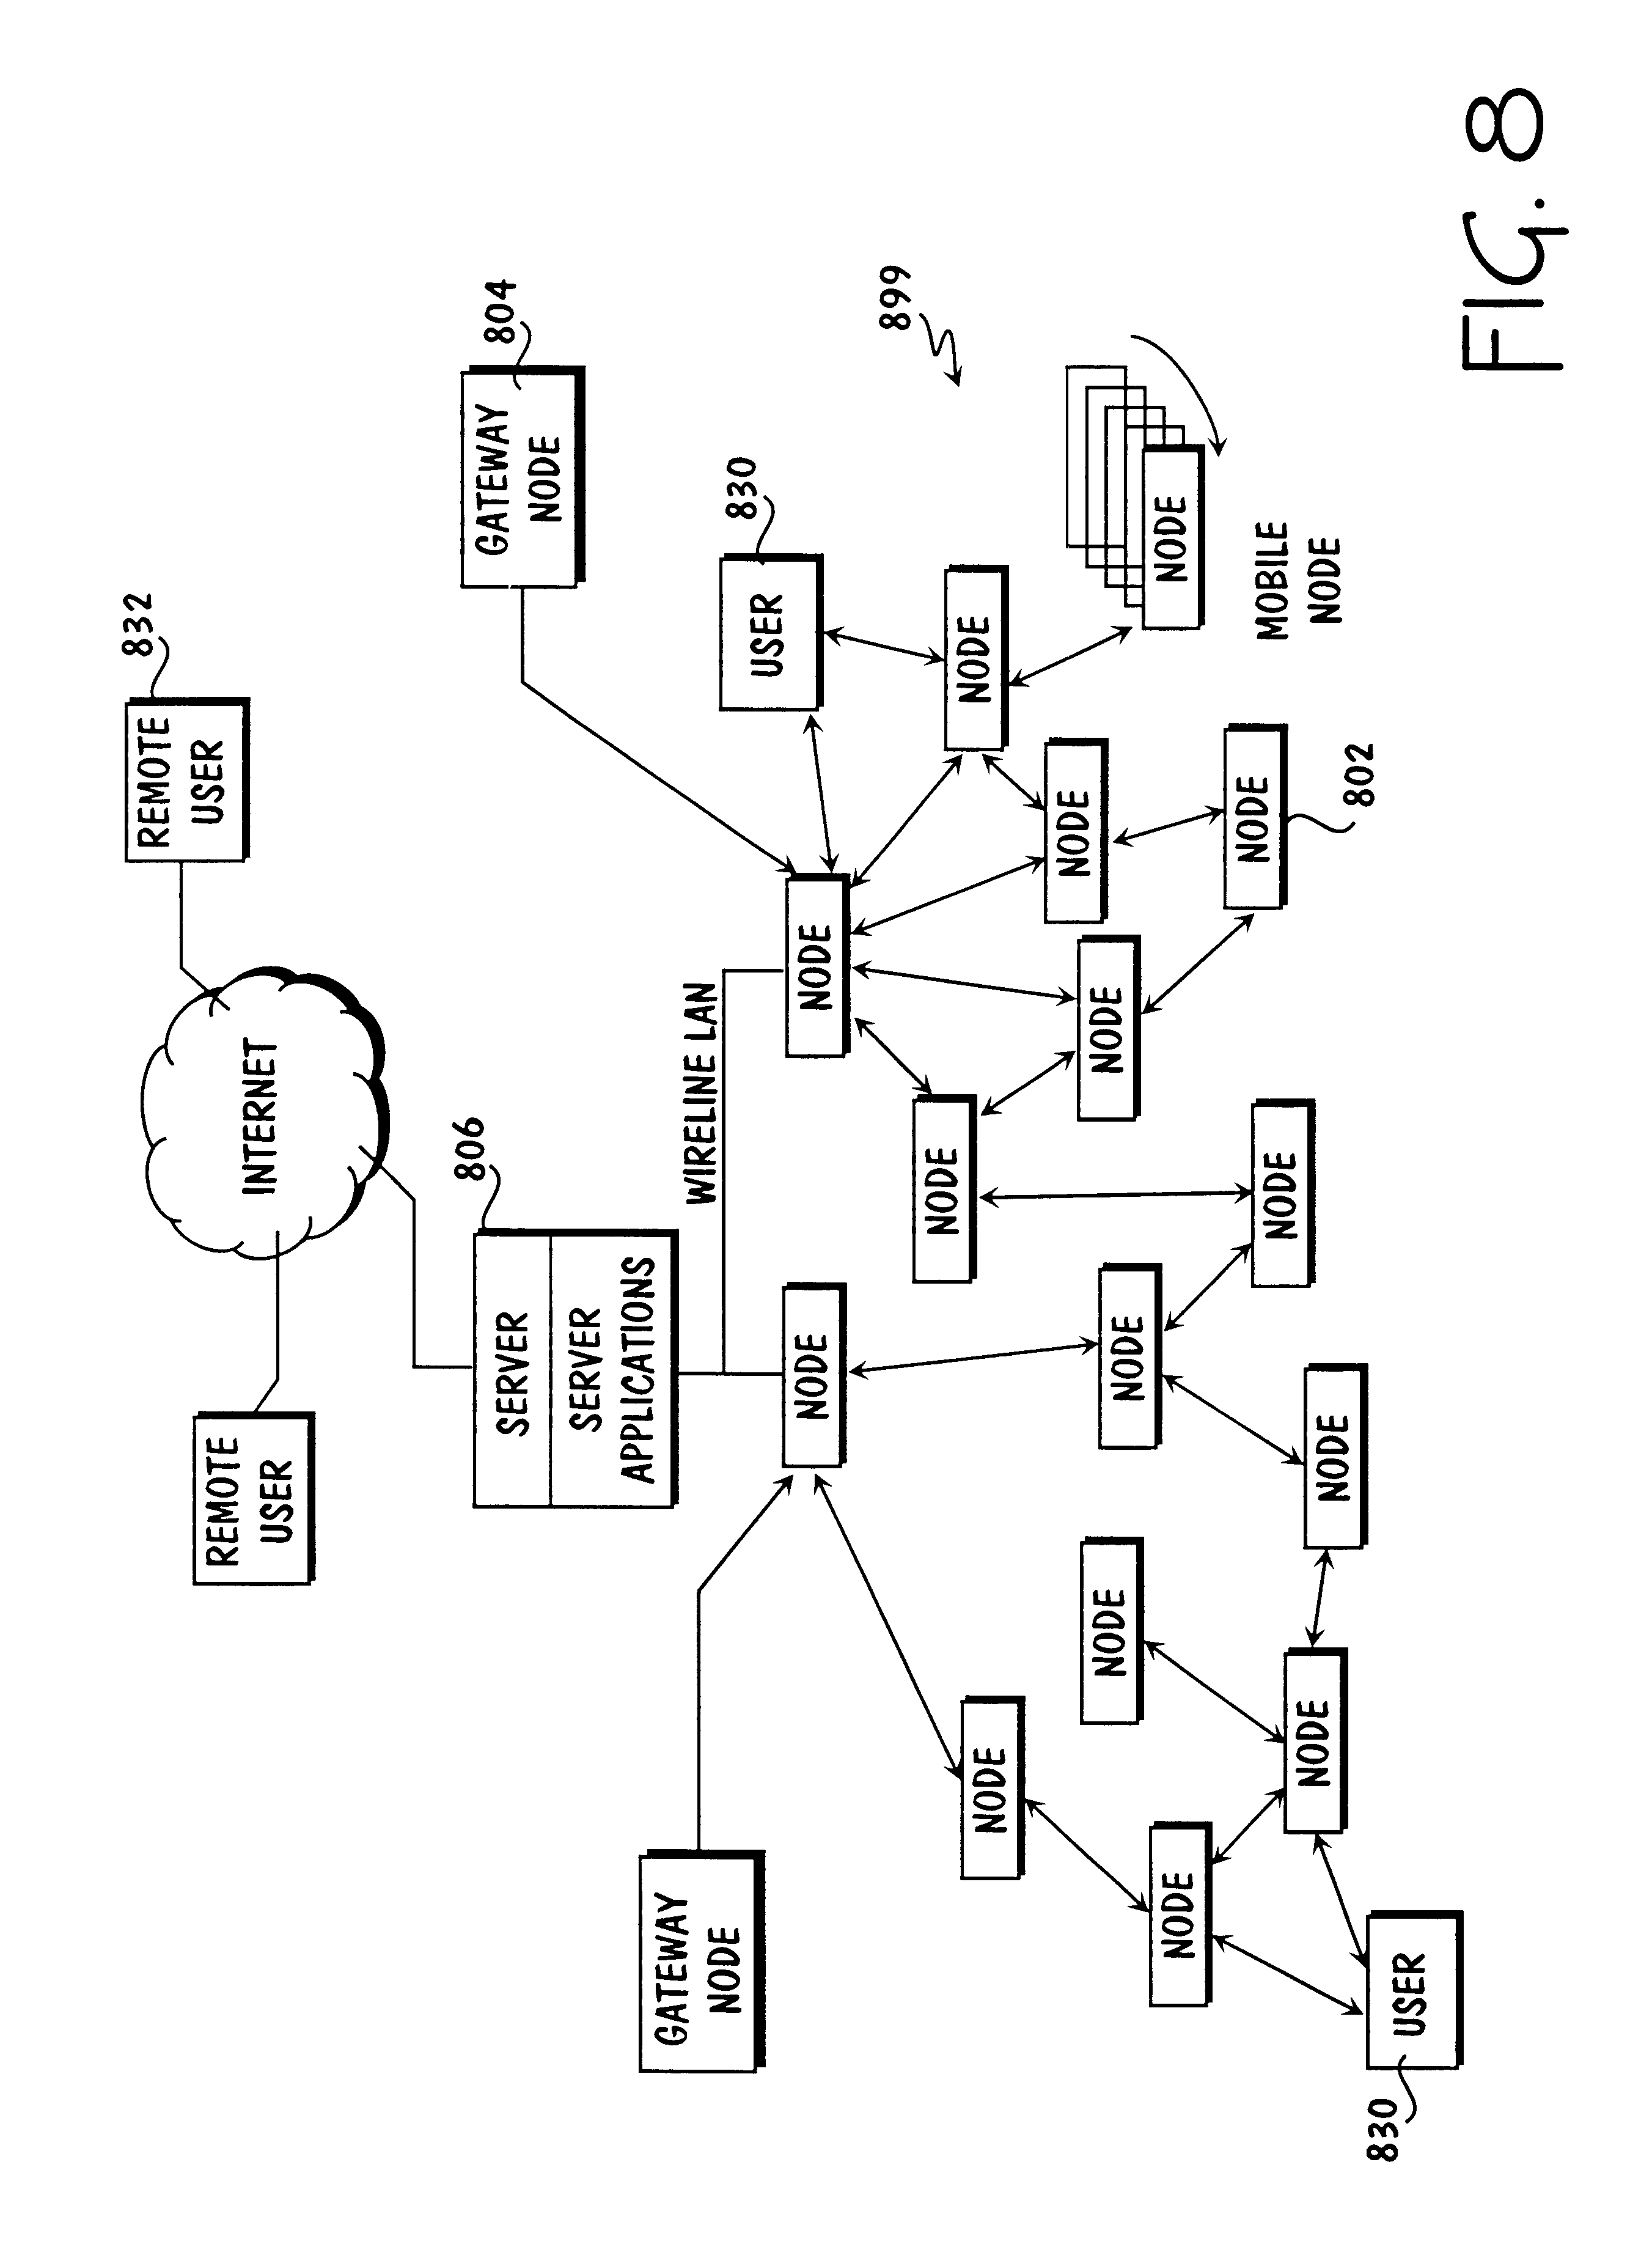 patent us 6 859 831 b1  patent